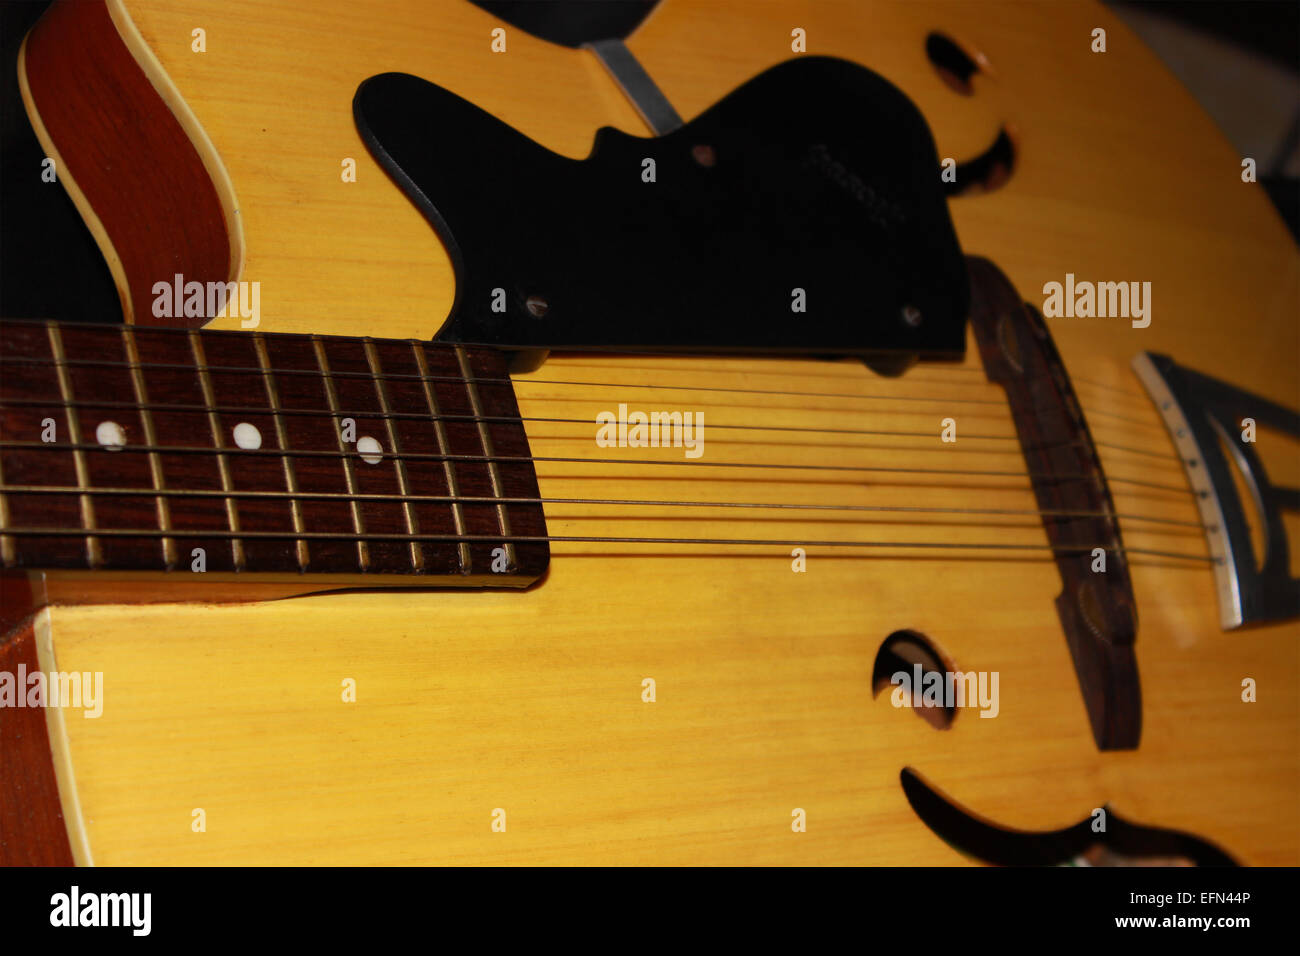 Guitar Jazz Neck Backdrop Audio Group Midi Concert Classic